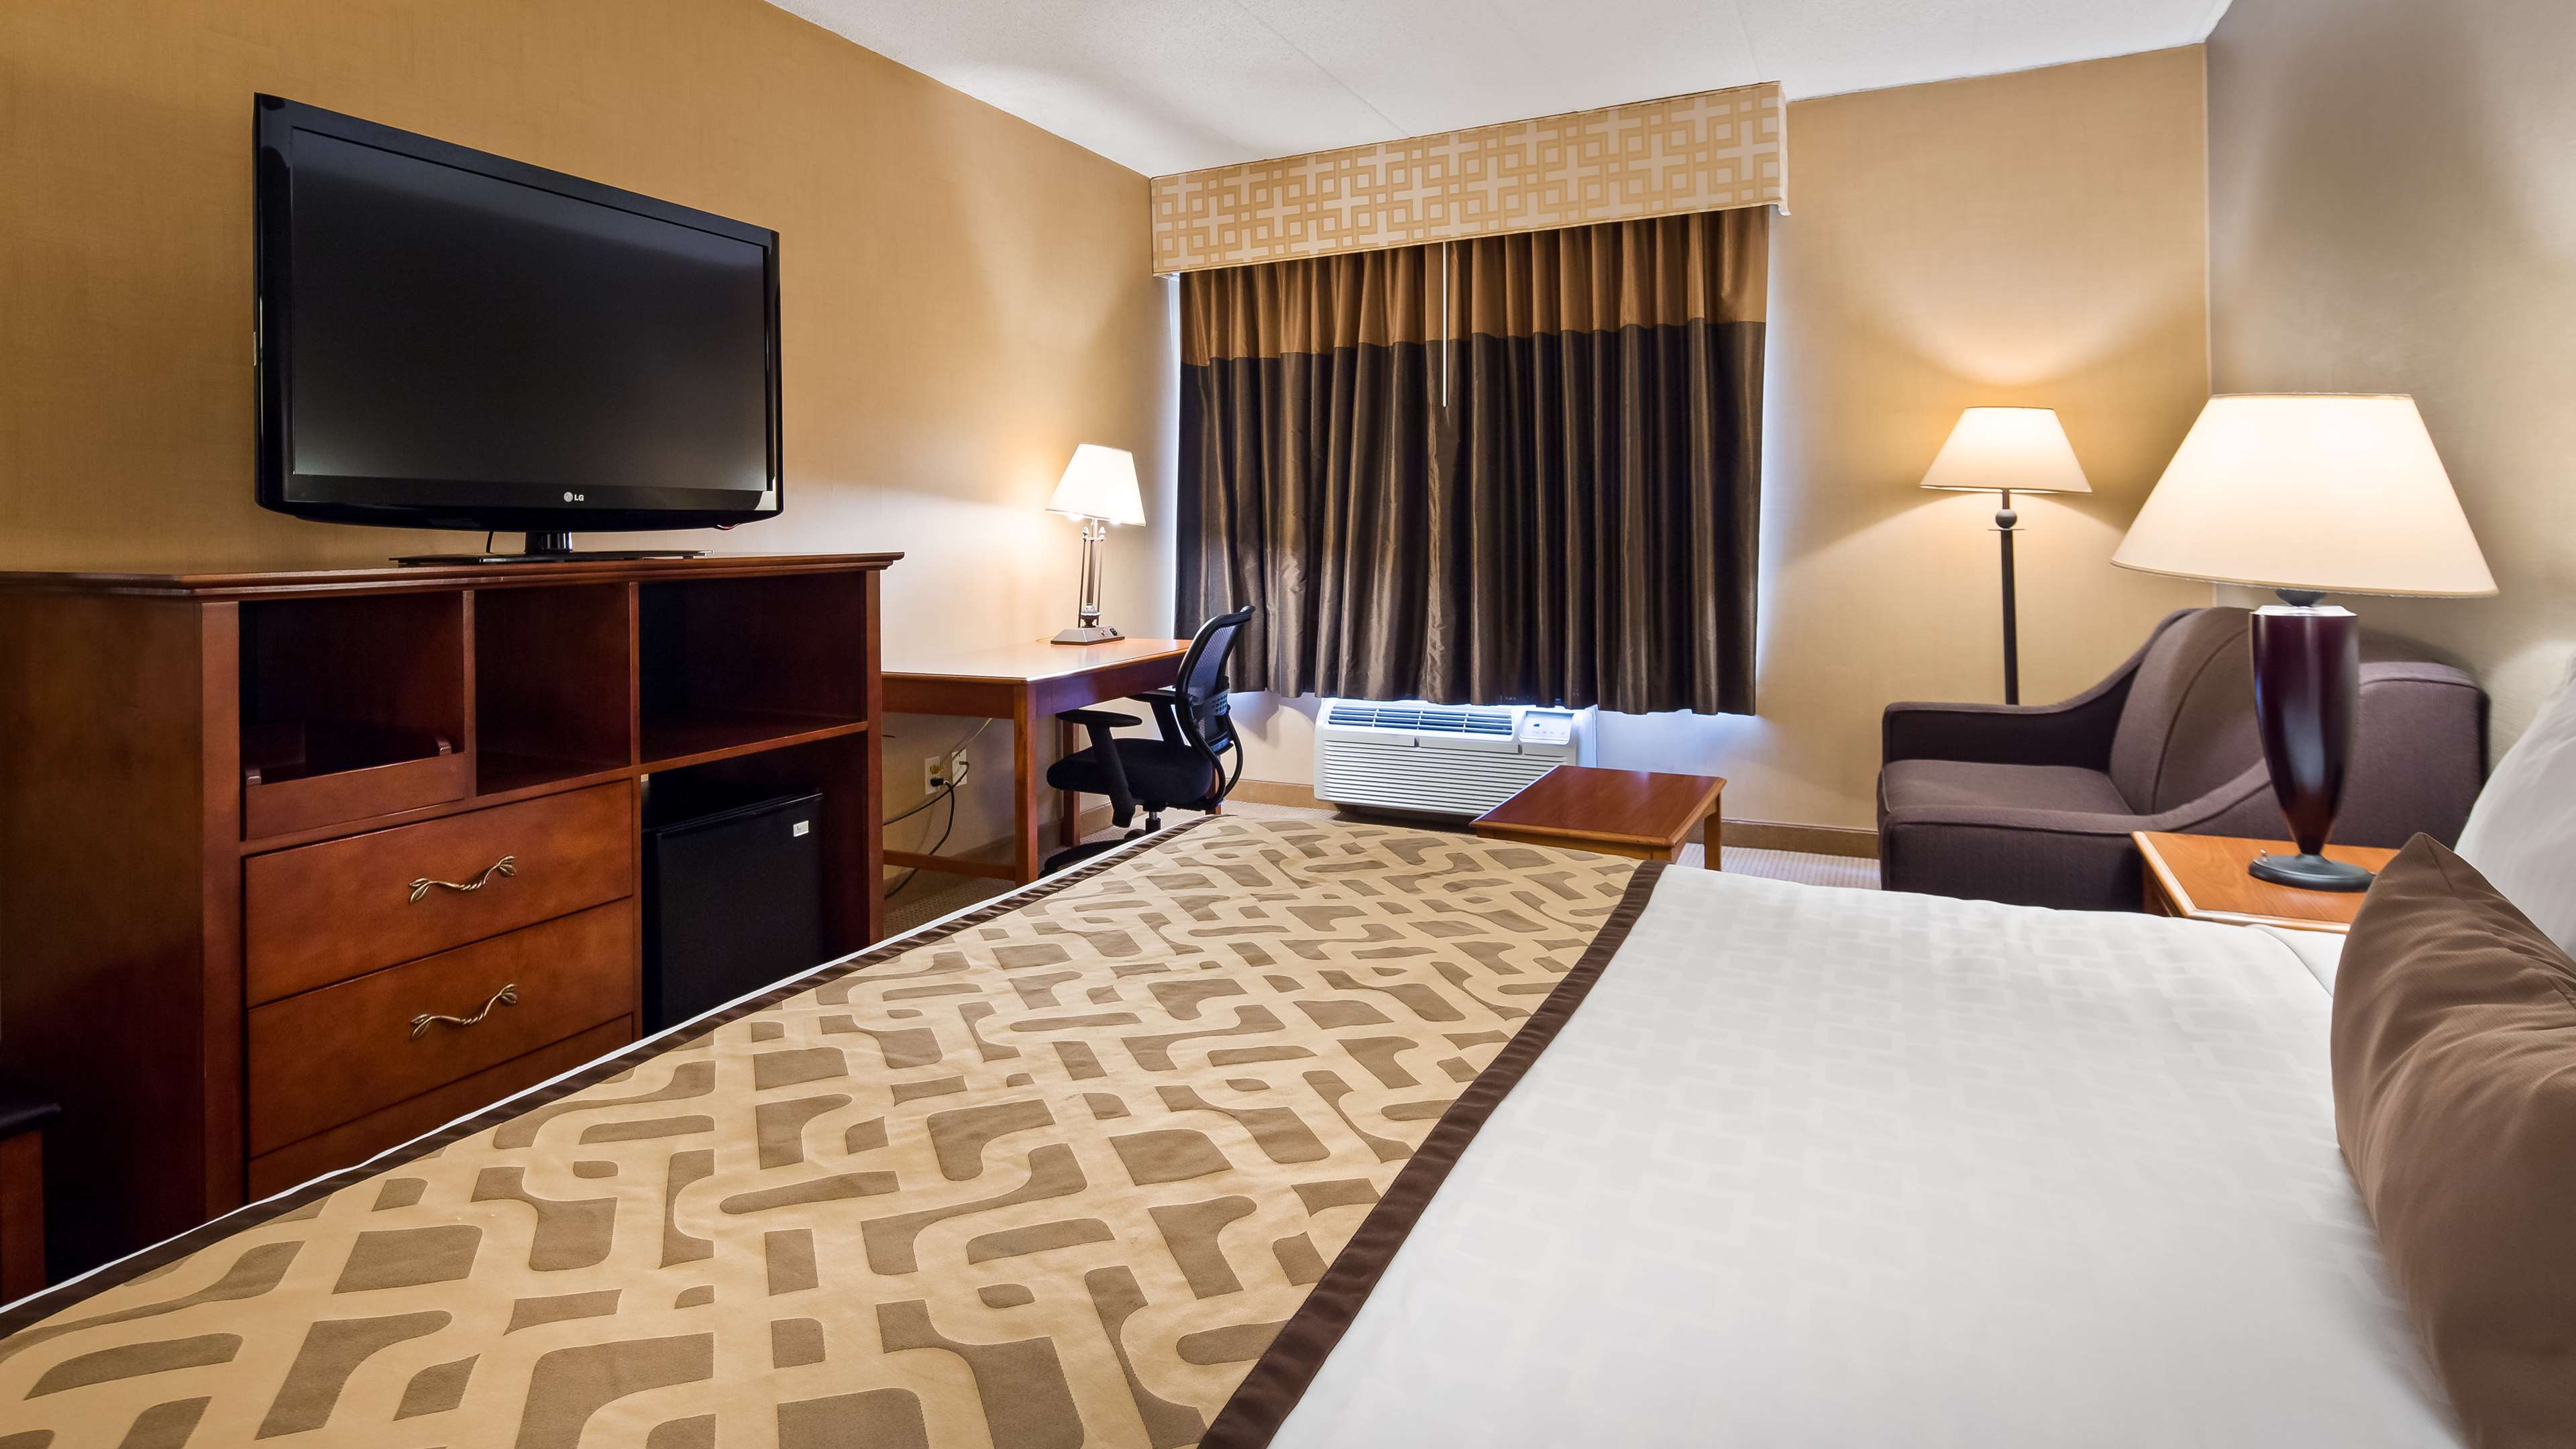 Best Western Plus North Haven Hotel image 0